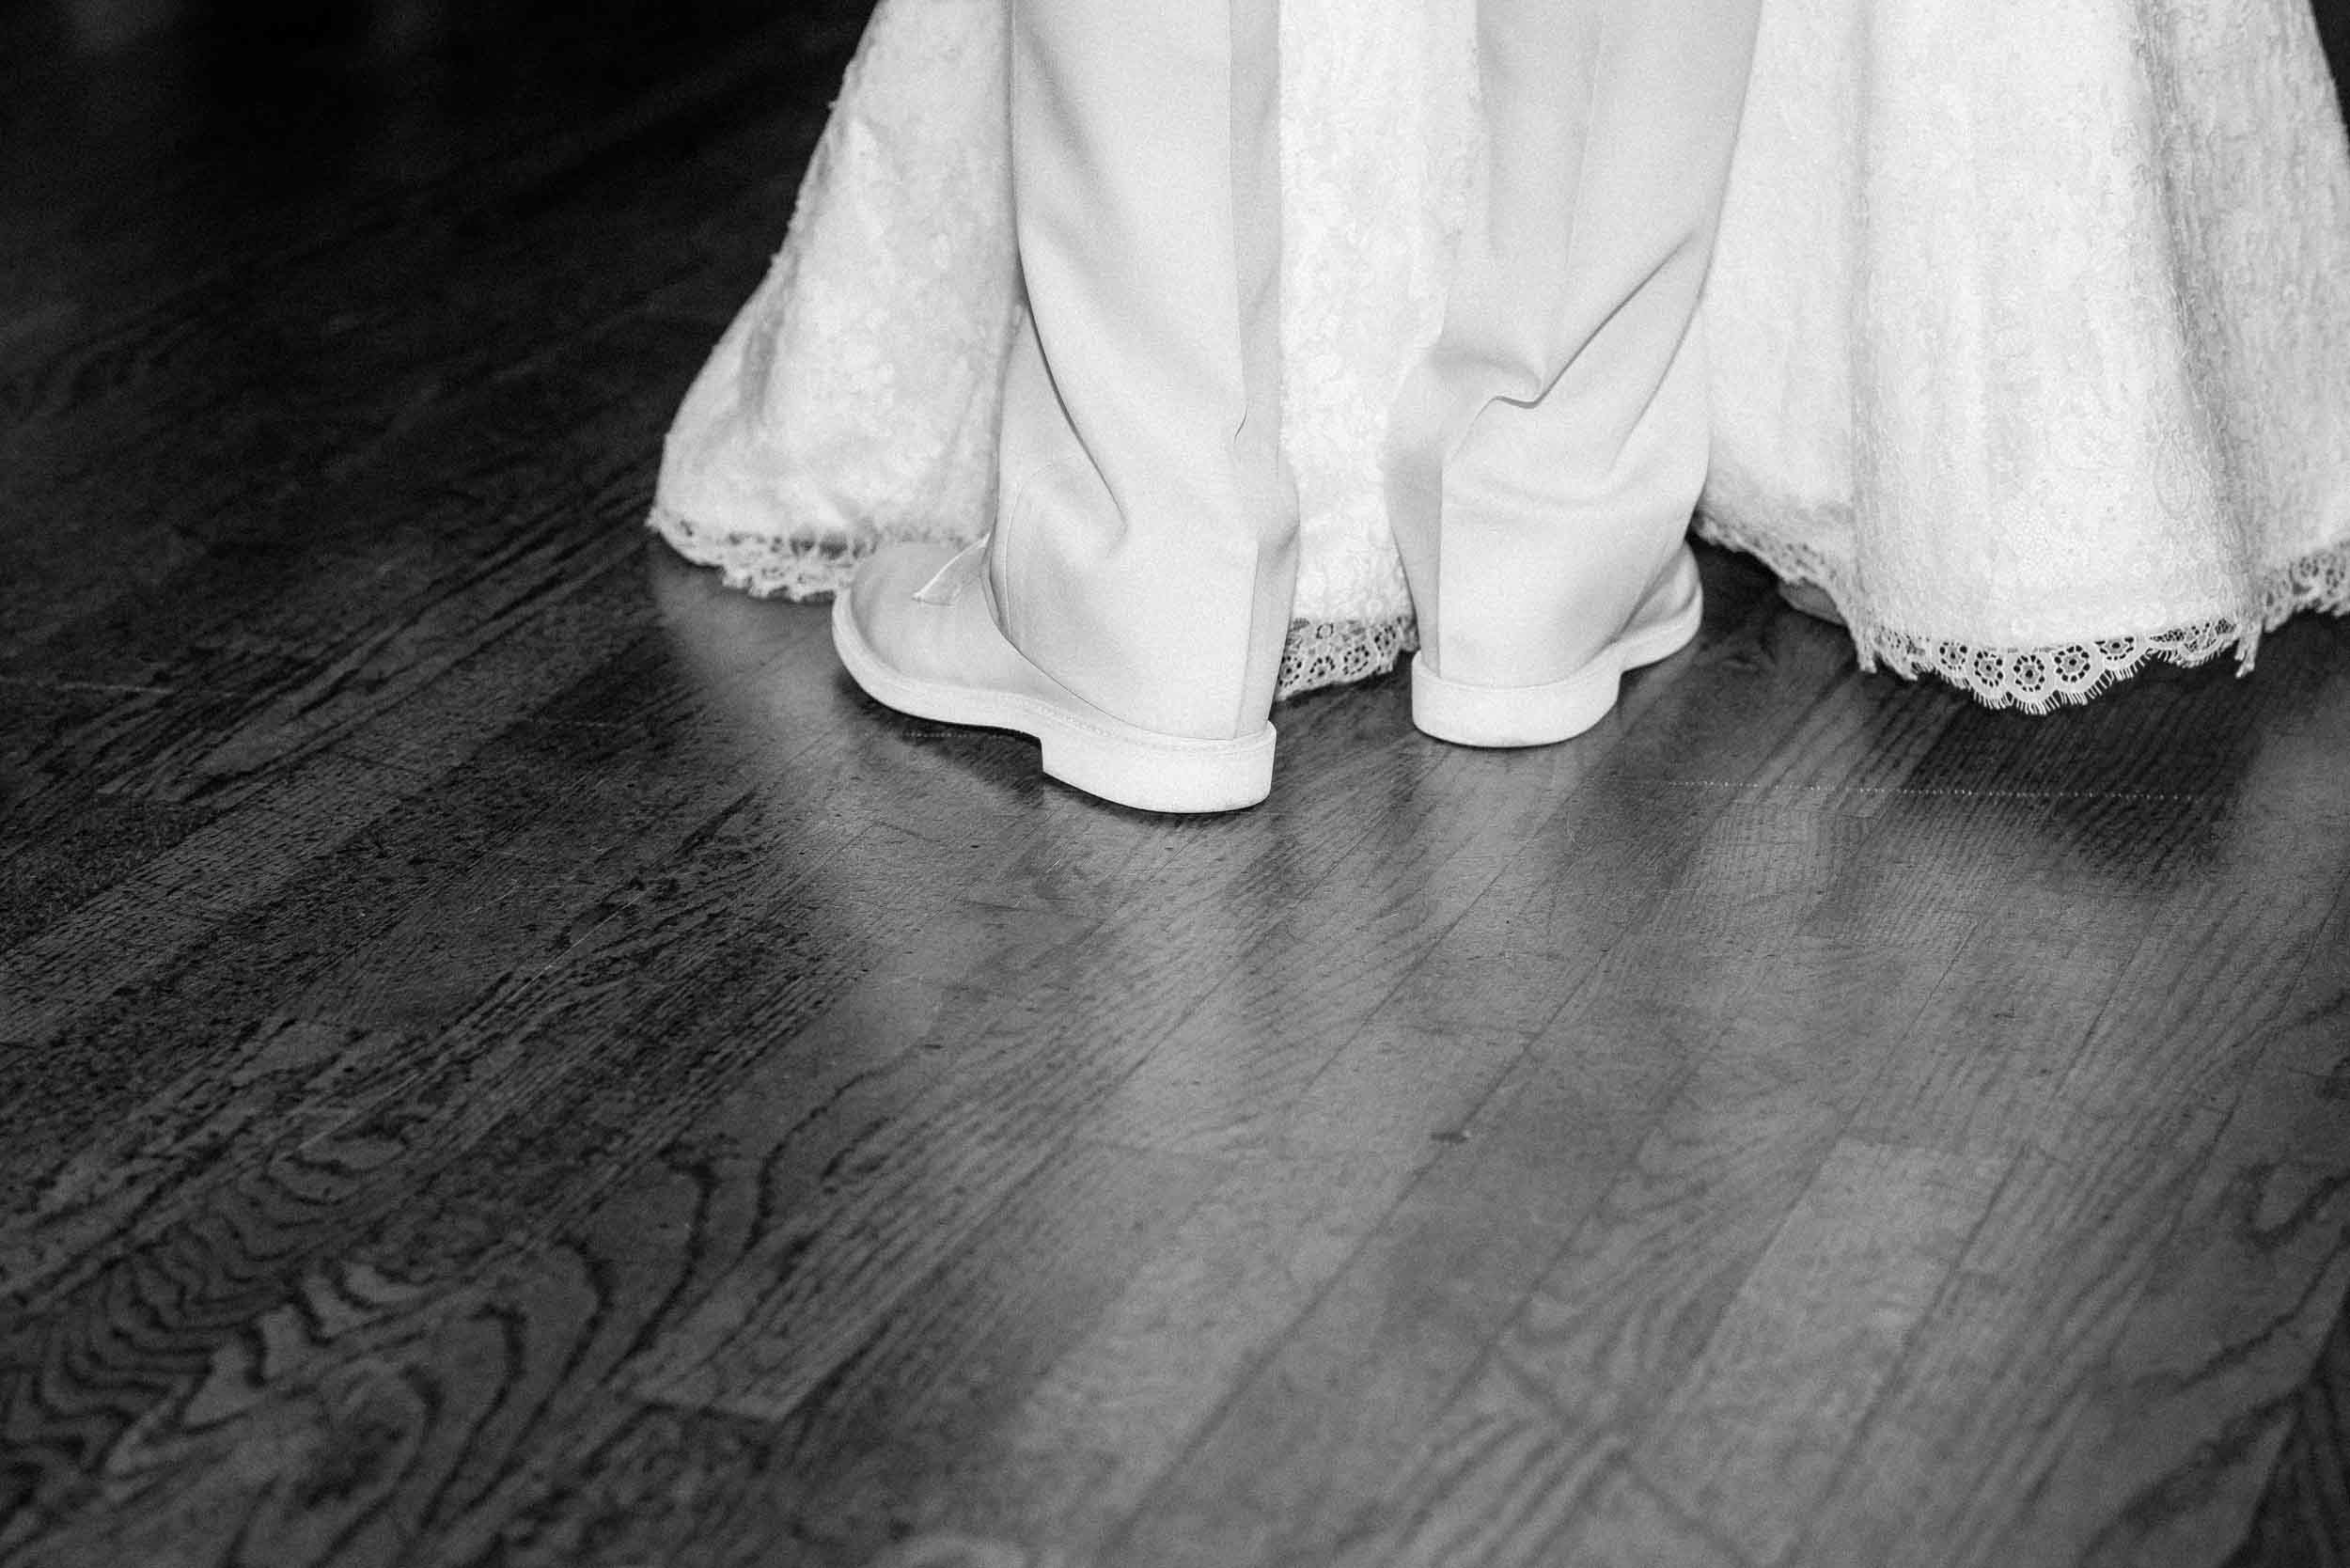 dc+metro+wedding+photographer+vadym+guliuk+photography+wedding+first+dance-2020.jpg